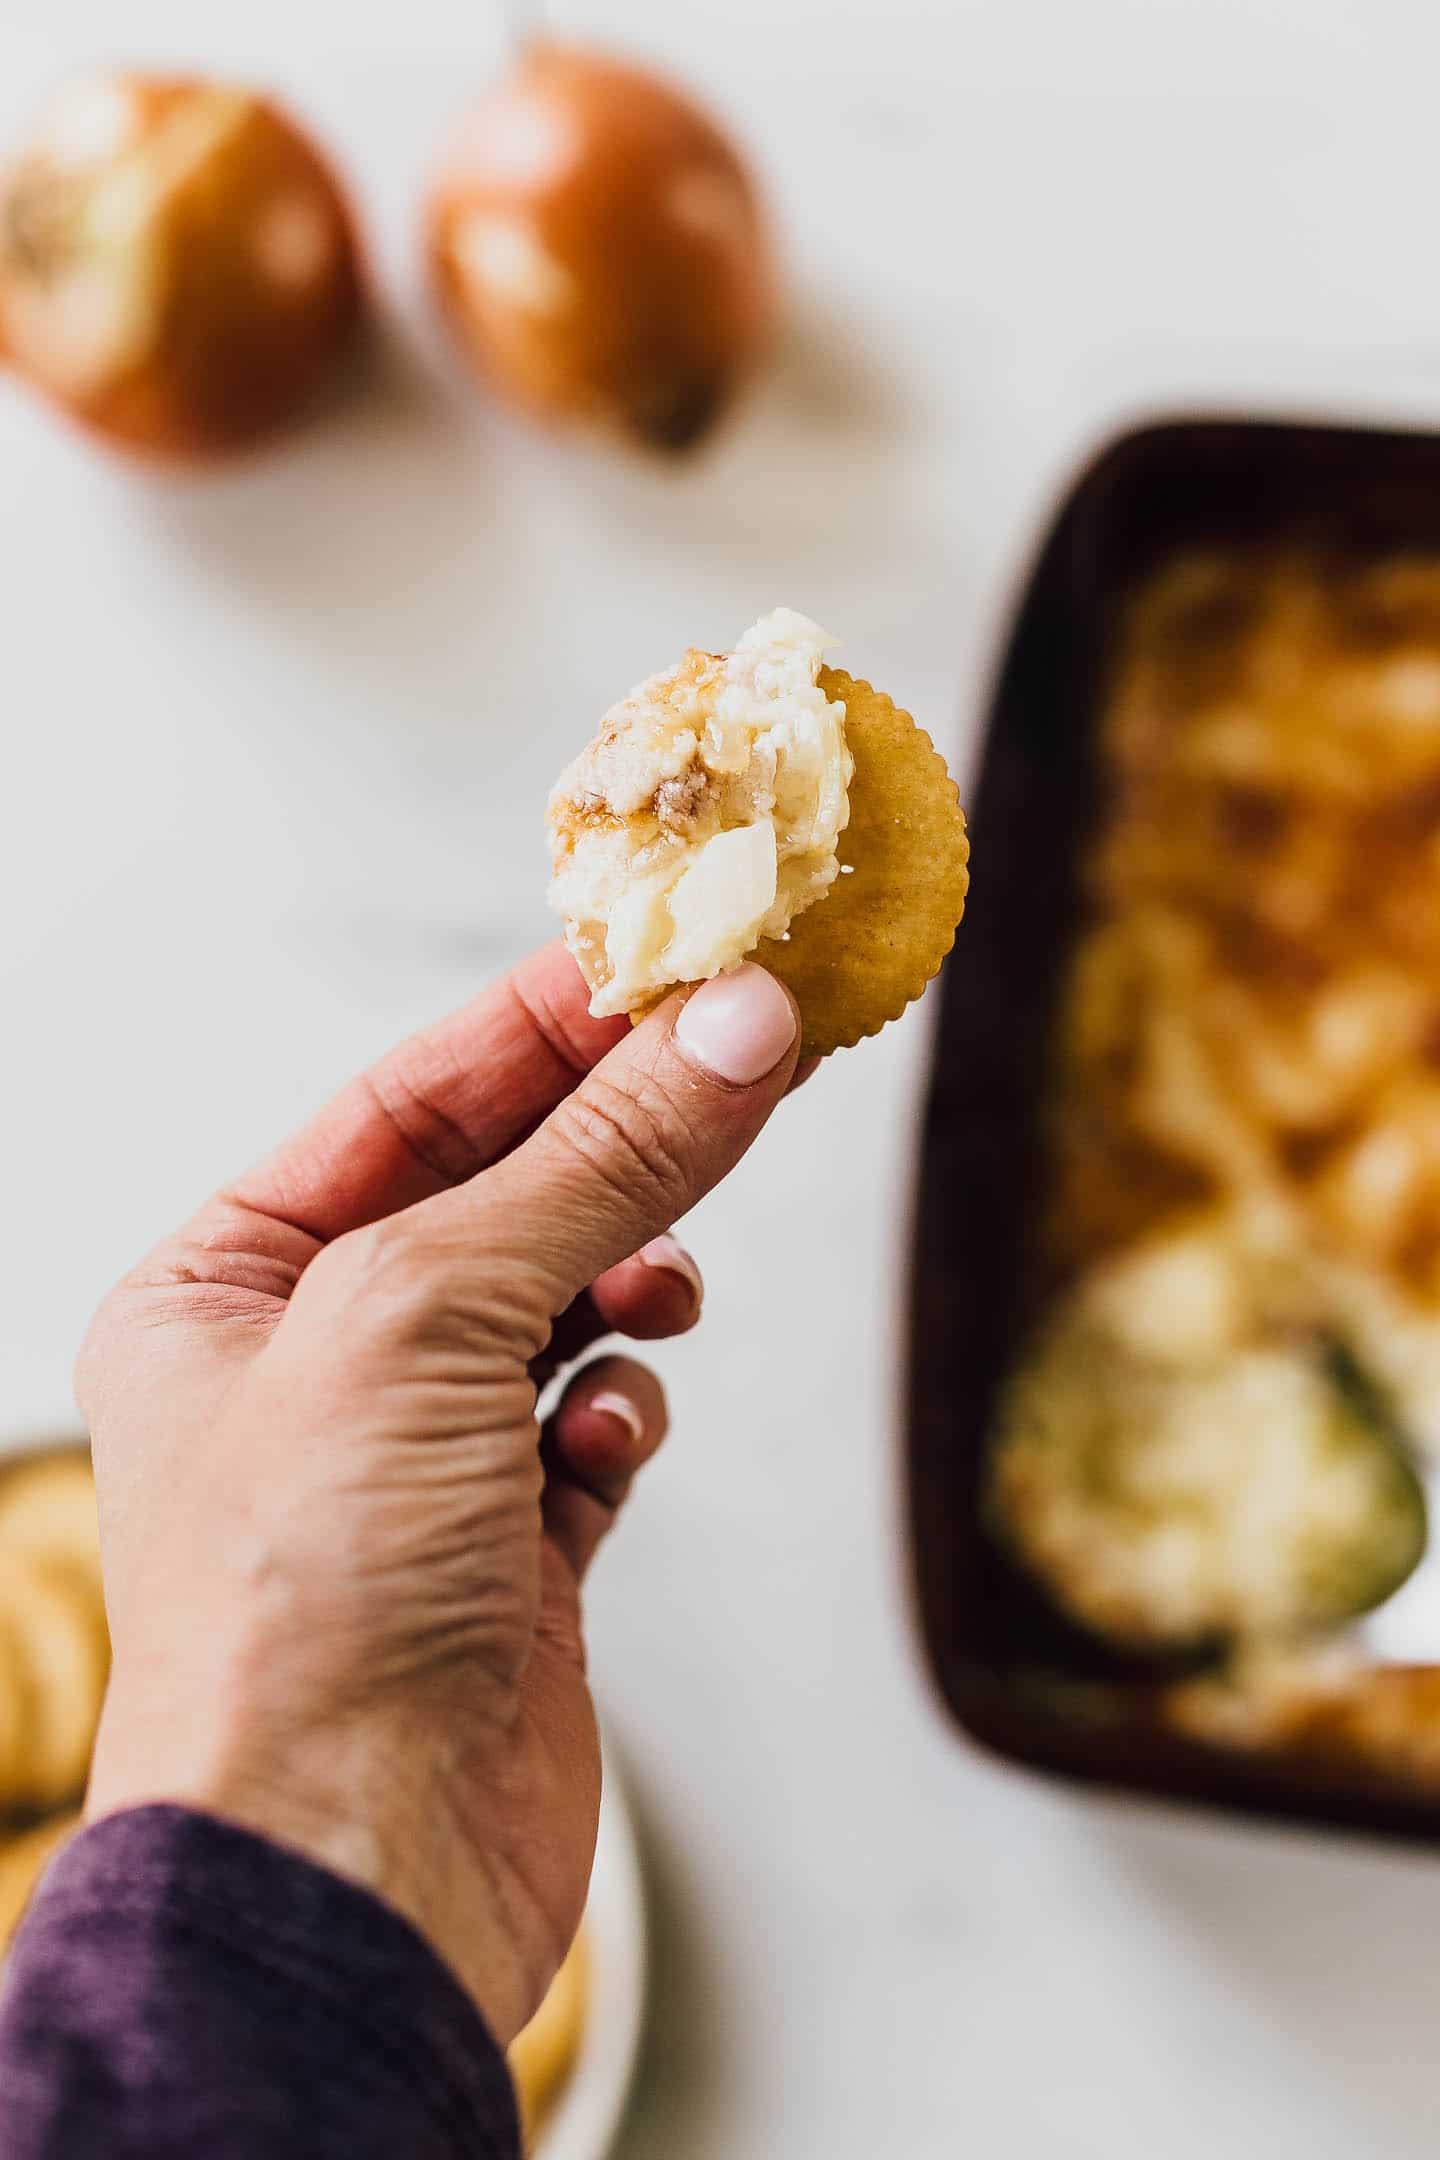 hot onion dip on a cracker.